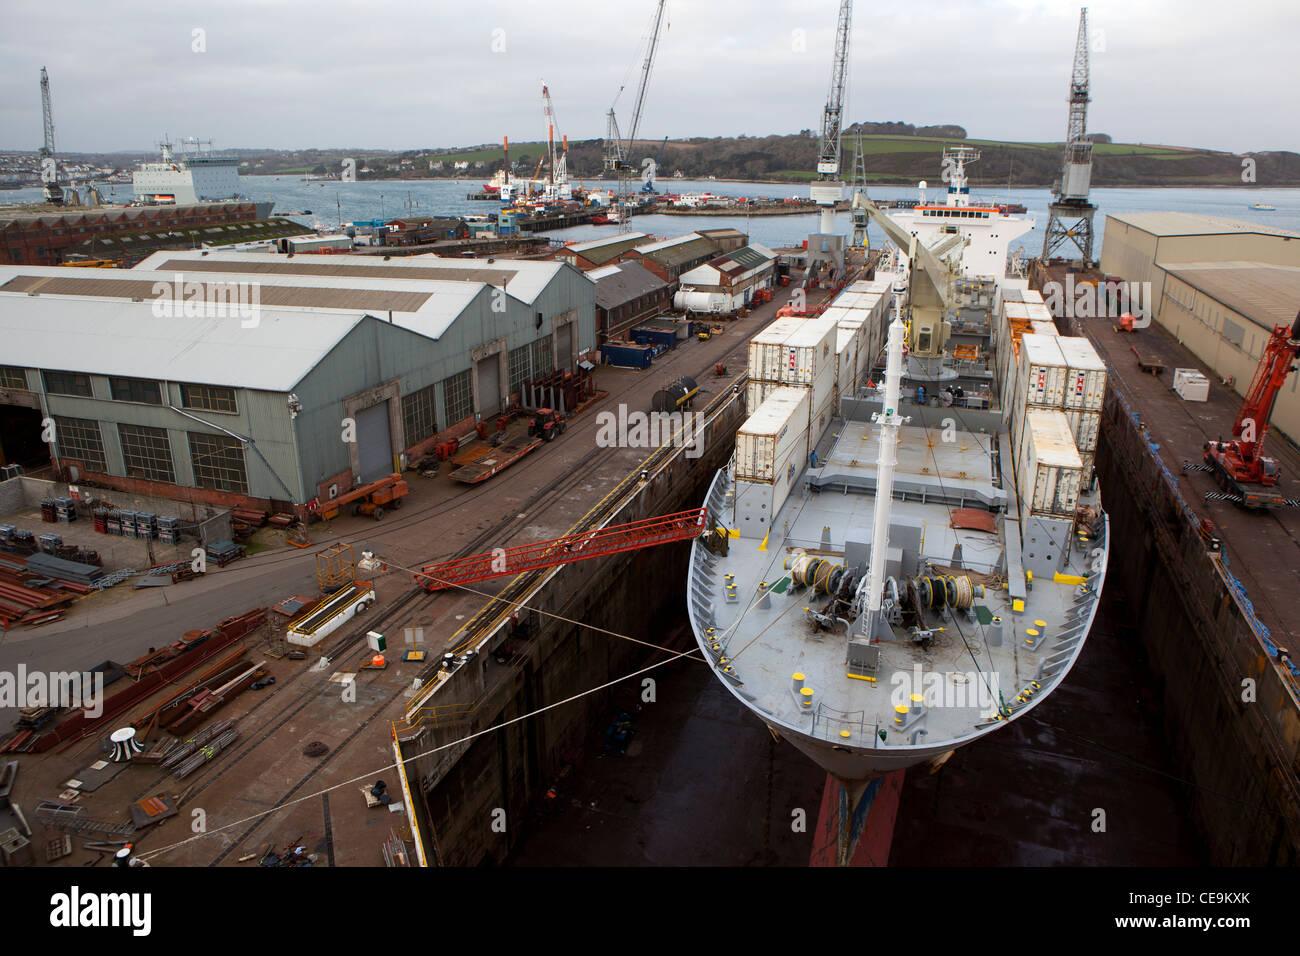 A ship in Falmouth docks, dry dock. Stock Photo